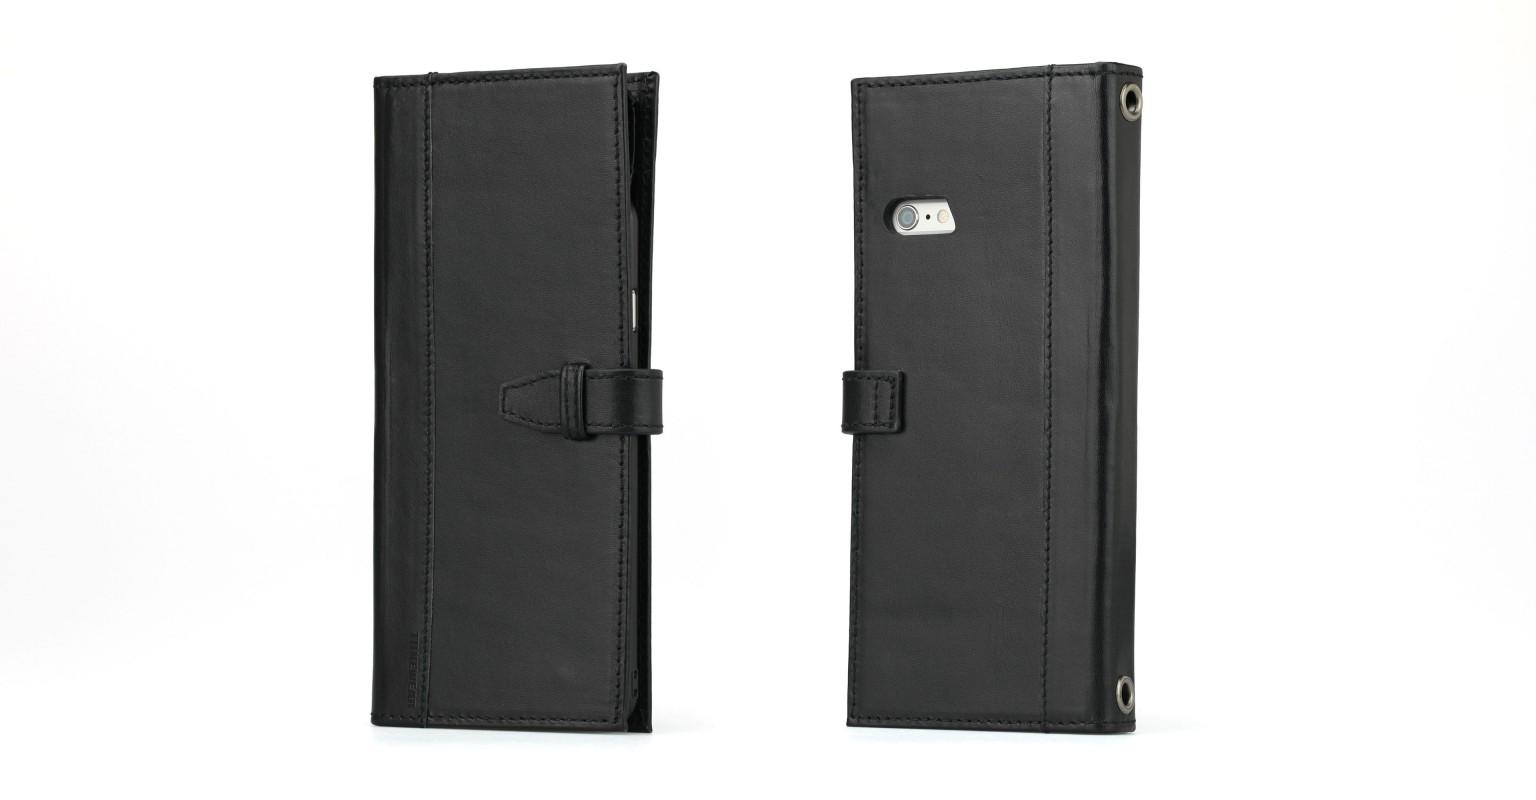 Completewallet for iPhone 6s Plus/6 Plus